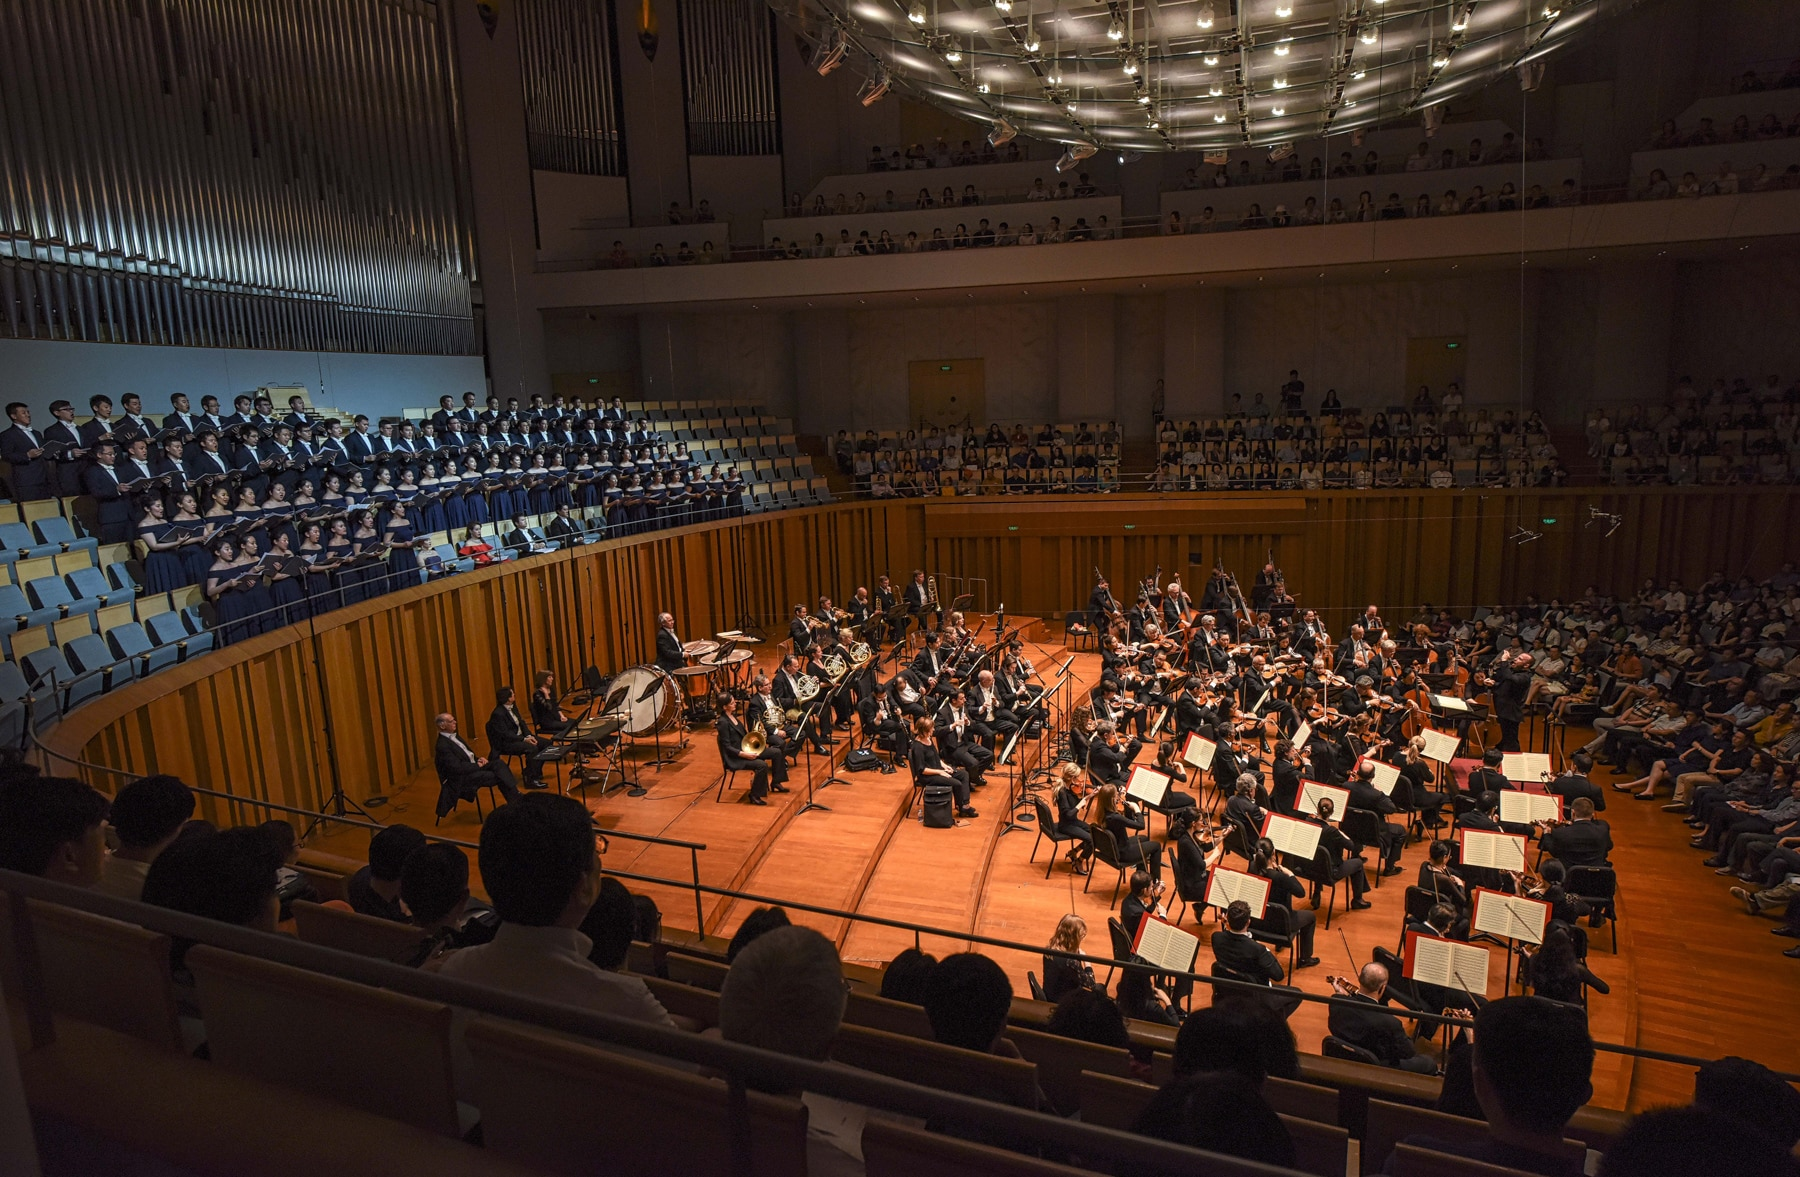 Orchestra performing in a concert hall (Jan Regan/Philadelphia Orchestra)